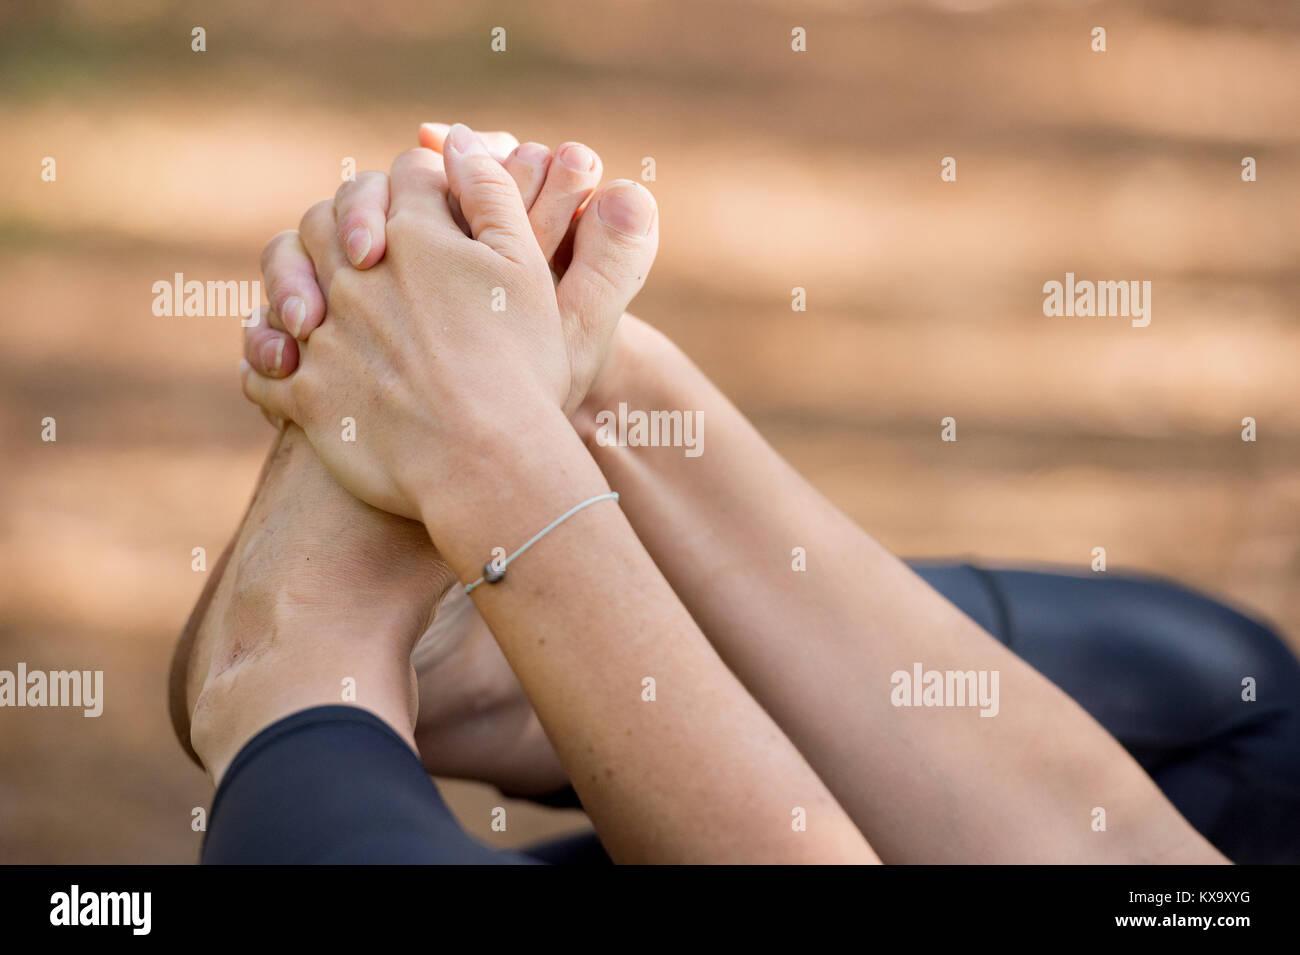 Woman practicing yoga in the sand - Happy Baby Pose - Ananda Balasana - Autumn day - Stock Image